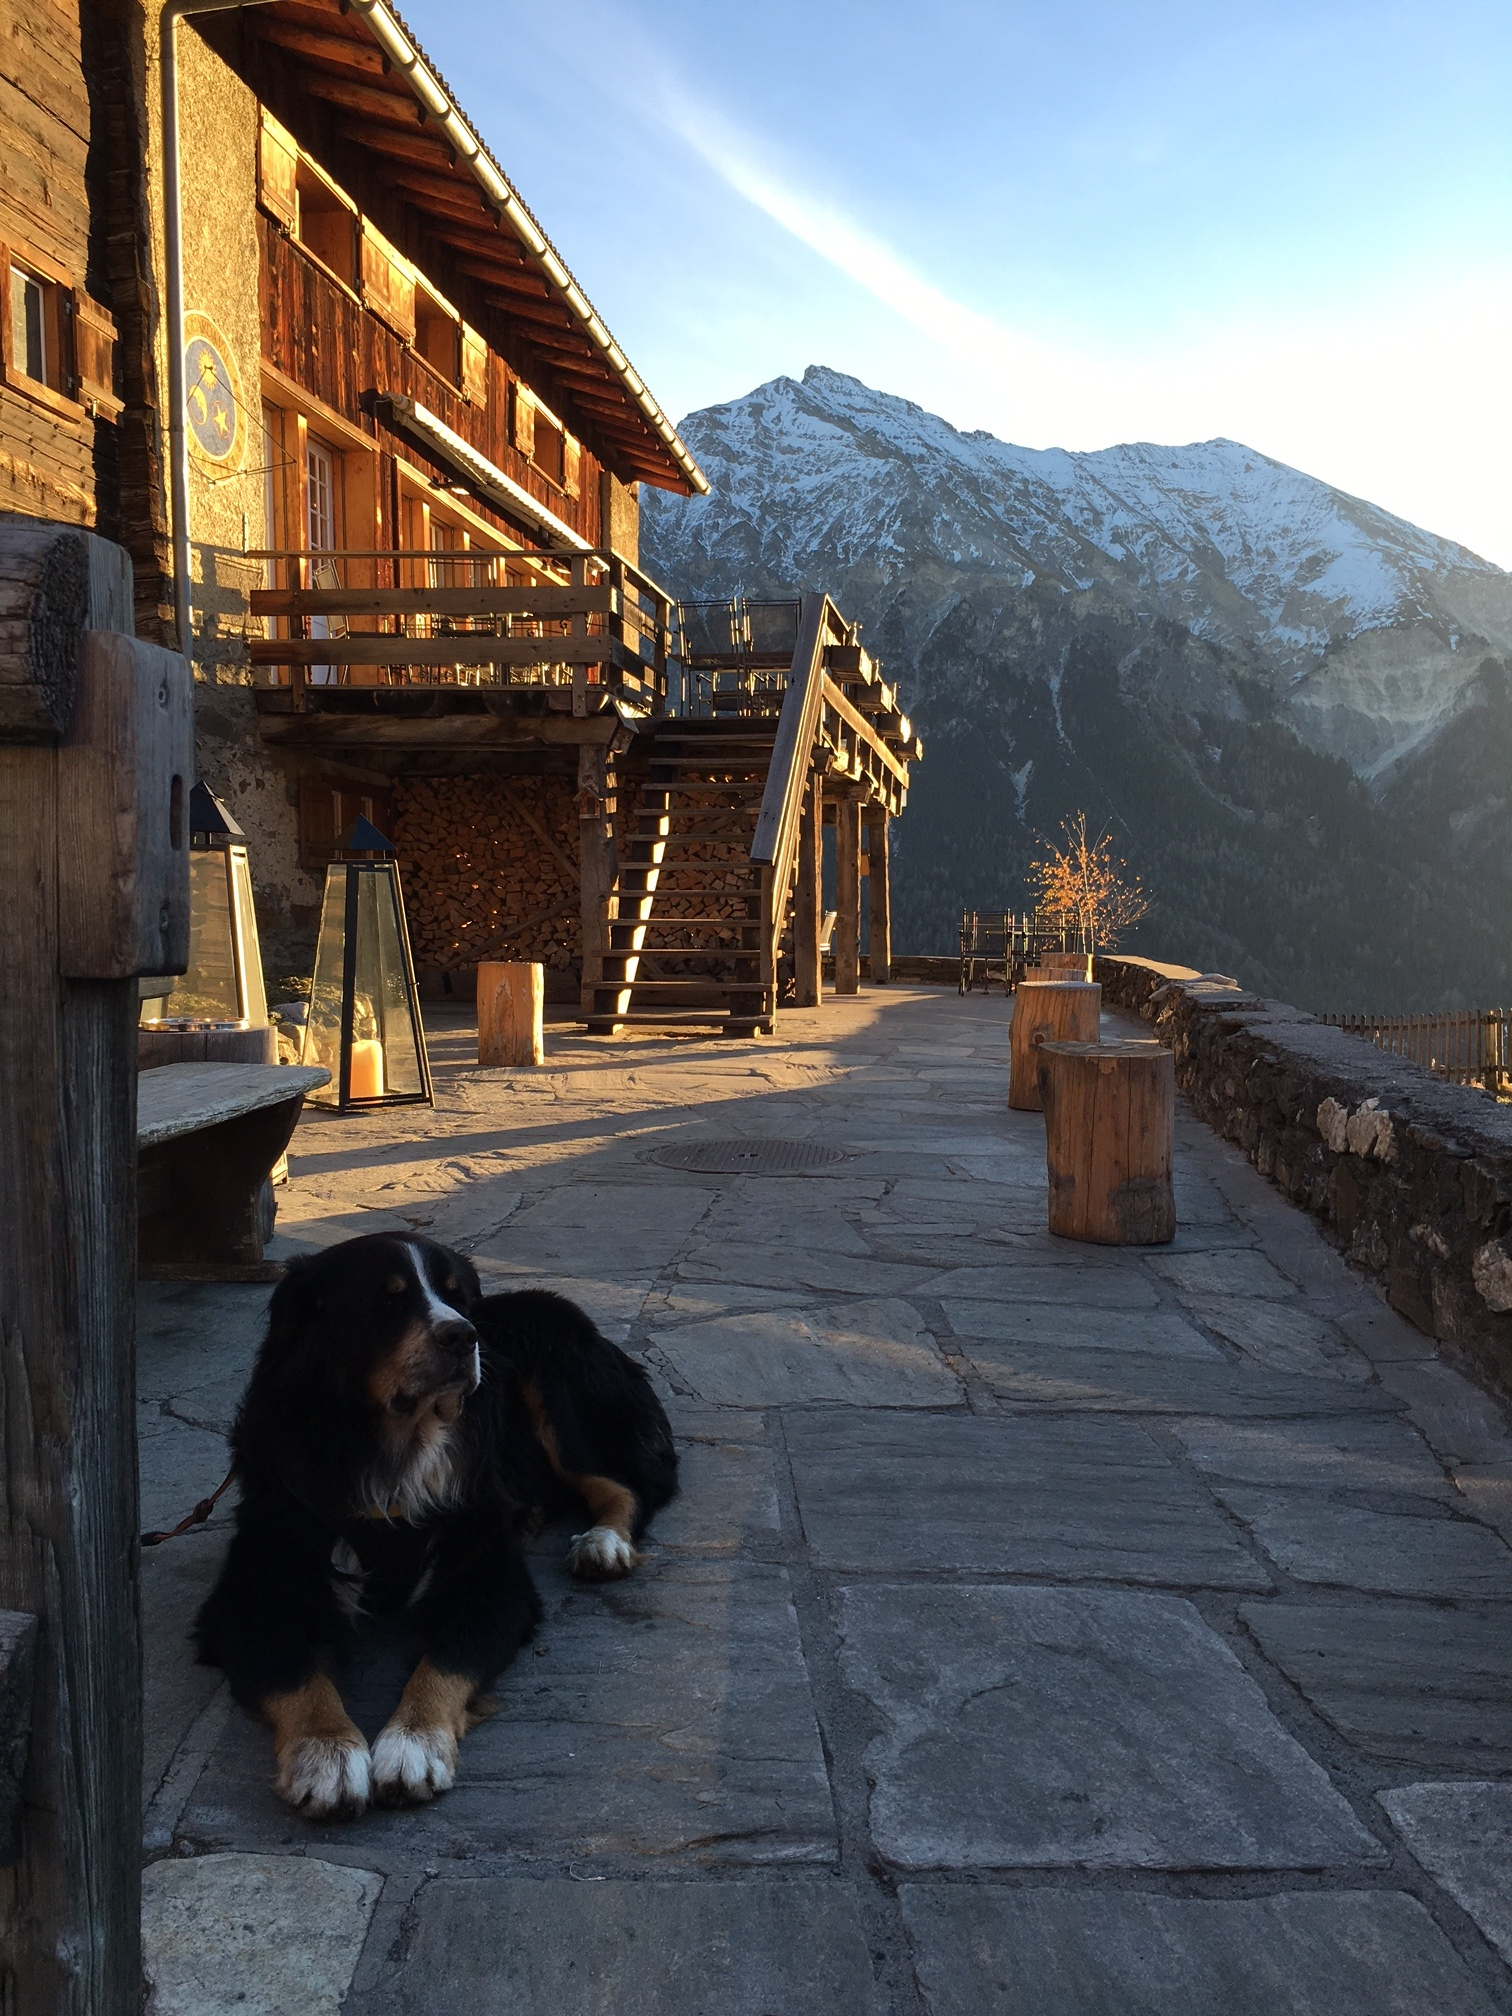 New favorite place - Lenzerheide, Switzerland